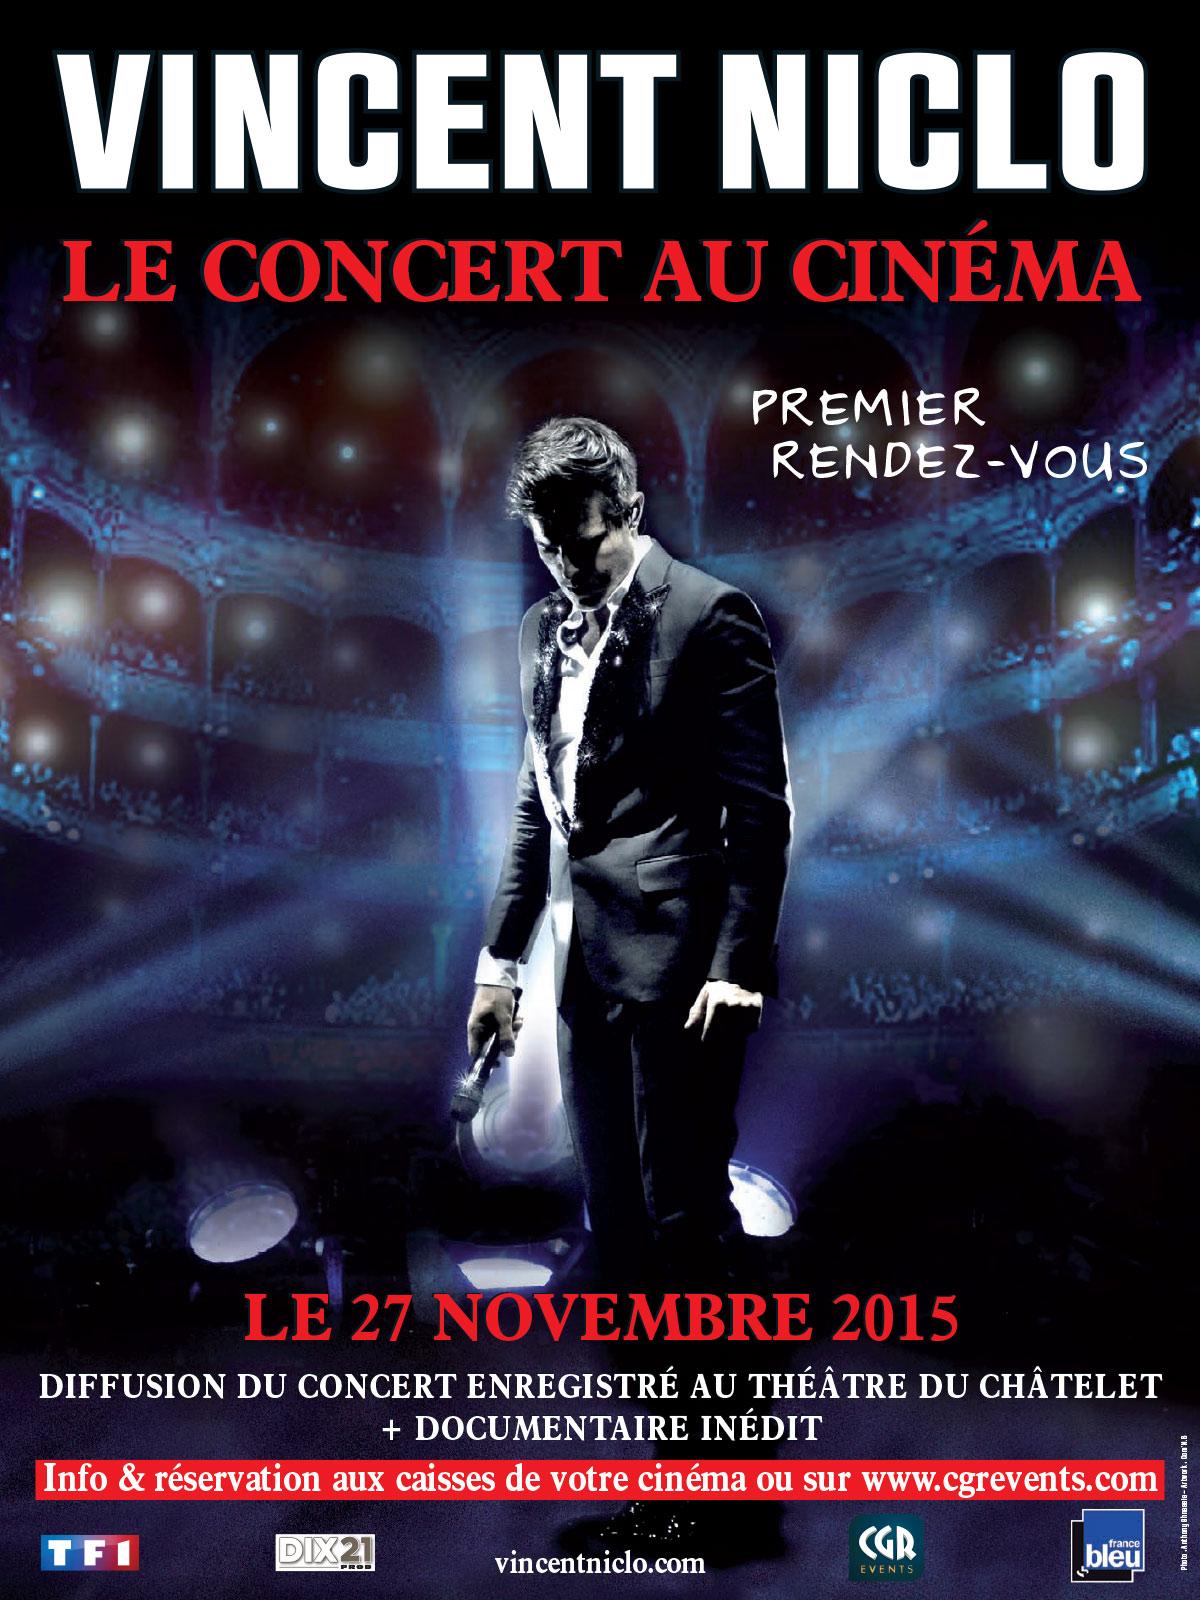 Télécharger Vincent Niclo - Le concert au cinéma (CGR Events) VF Complet Uploaded